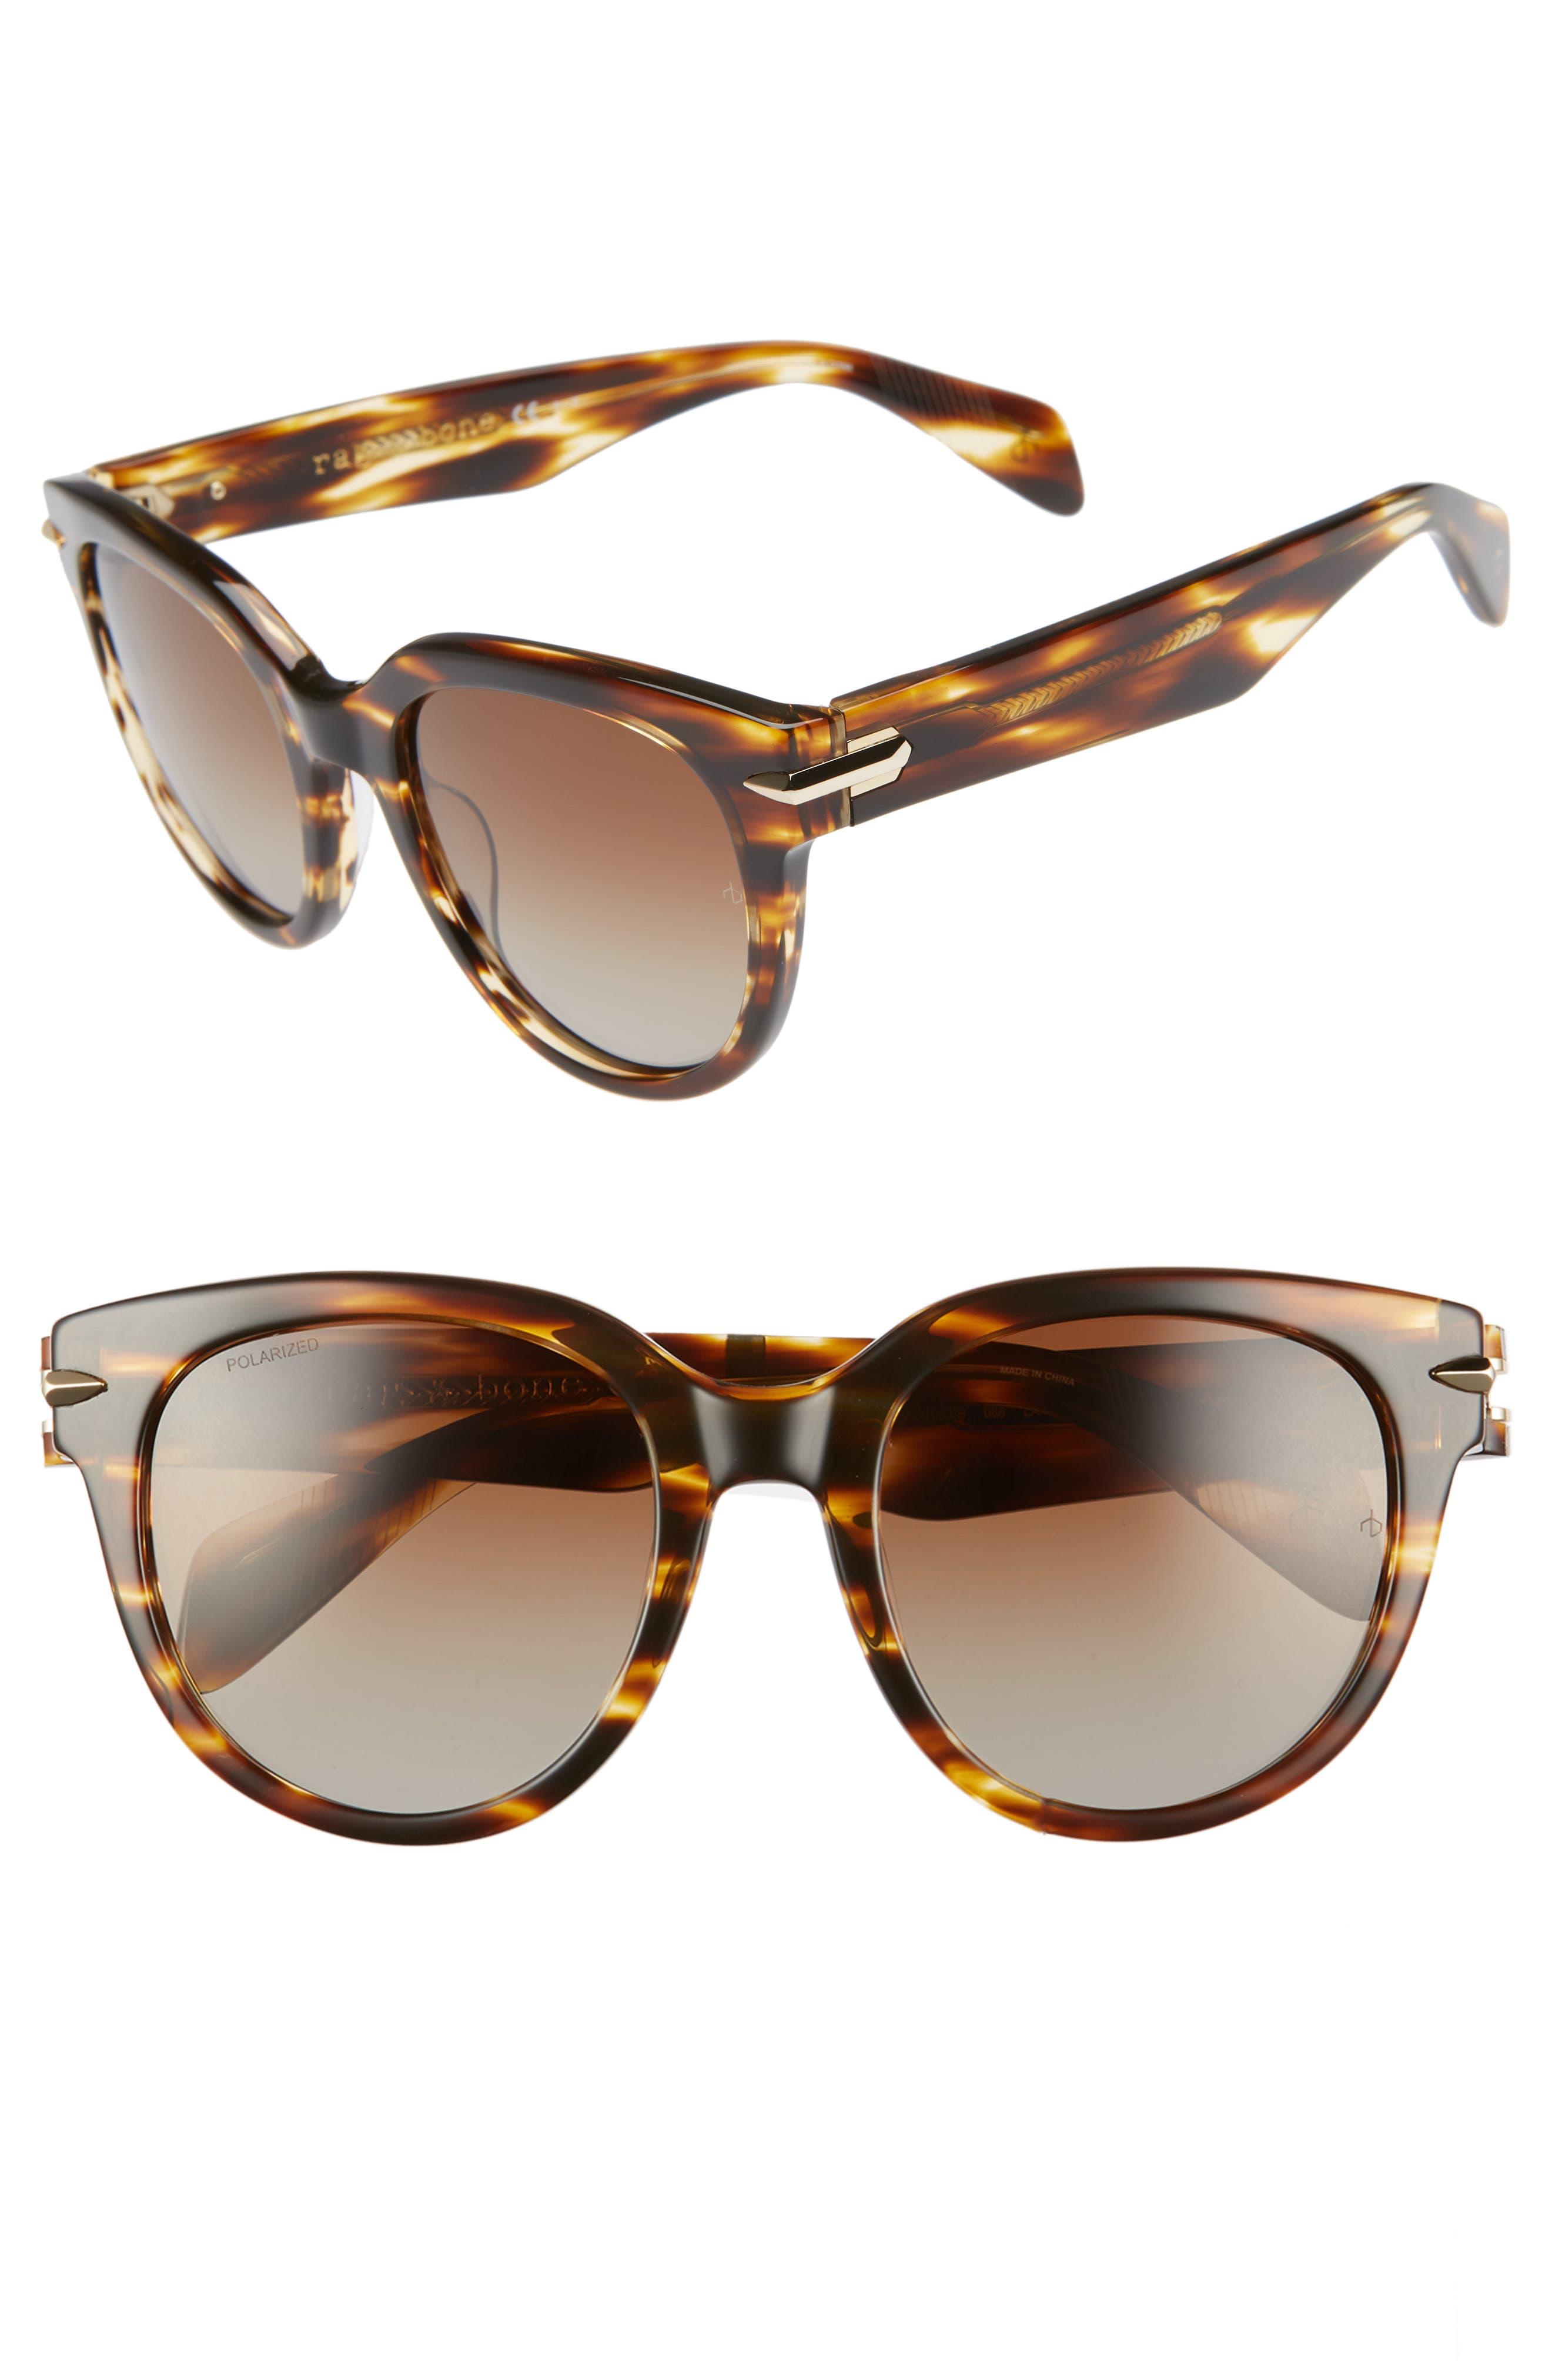 54mm Round Sunglasses,                         Main,                         color, DARK HAVANA